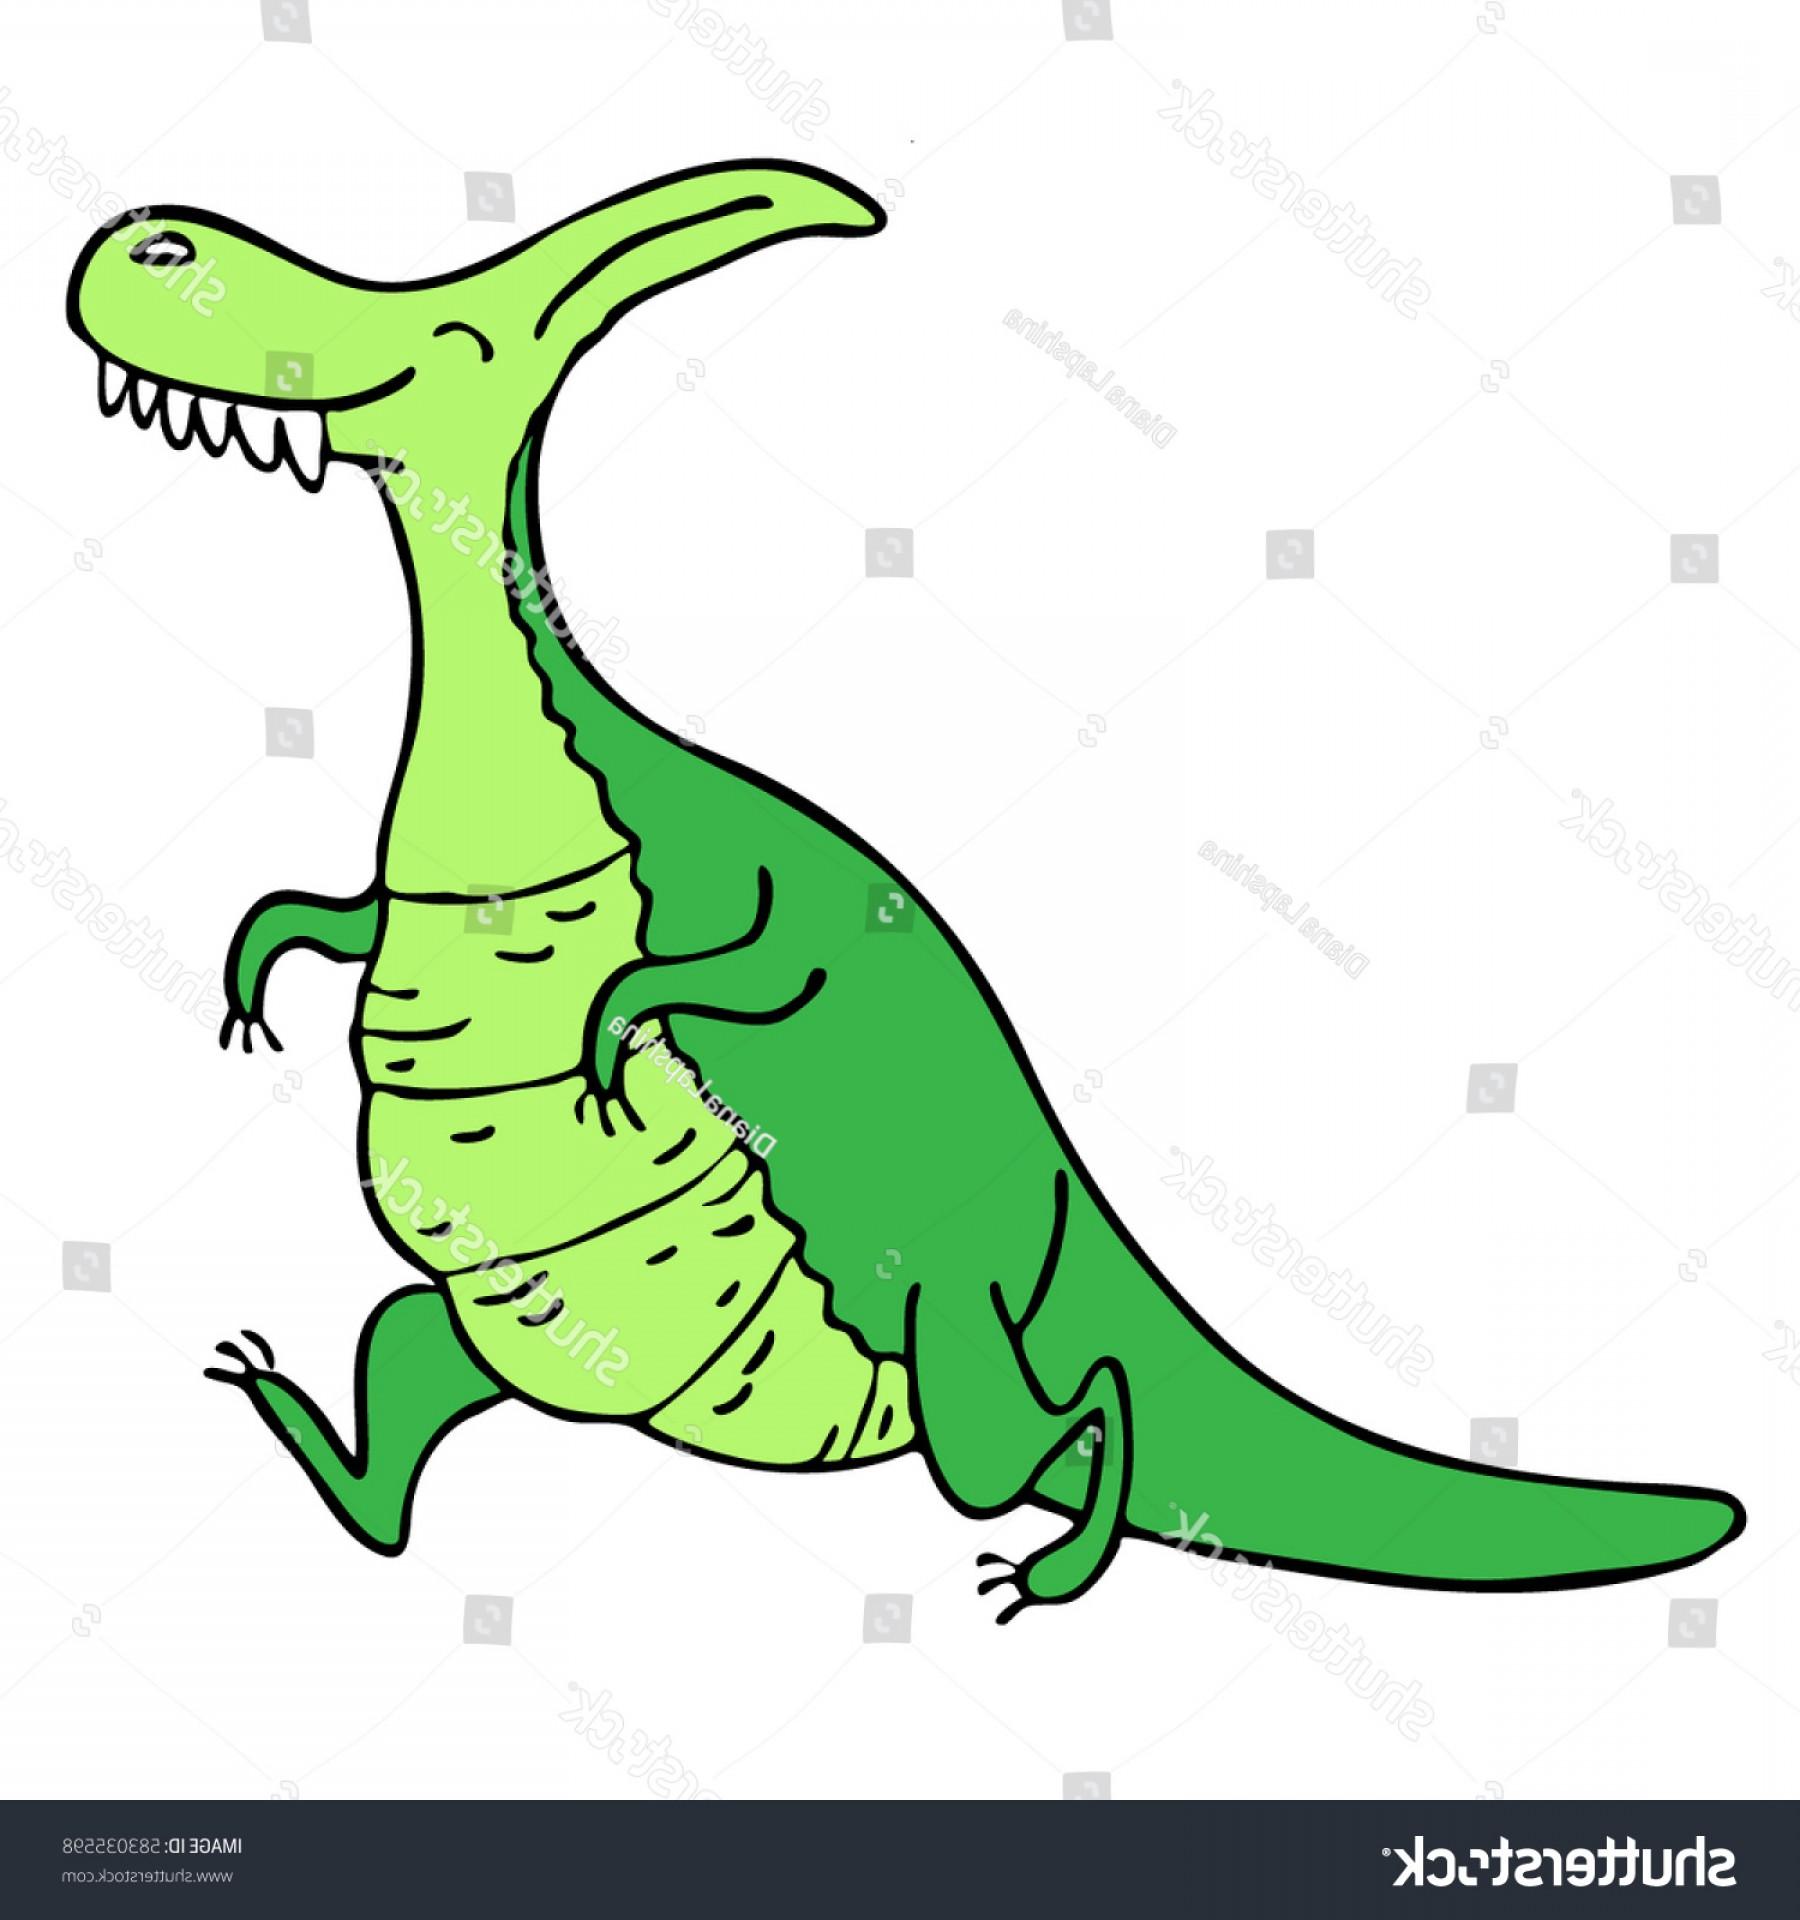 1800x1920 Dinosaur Vector Art Lazttweet